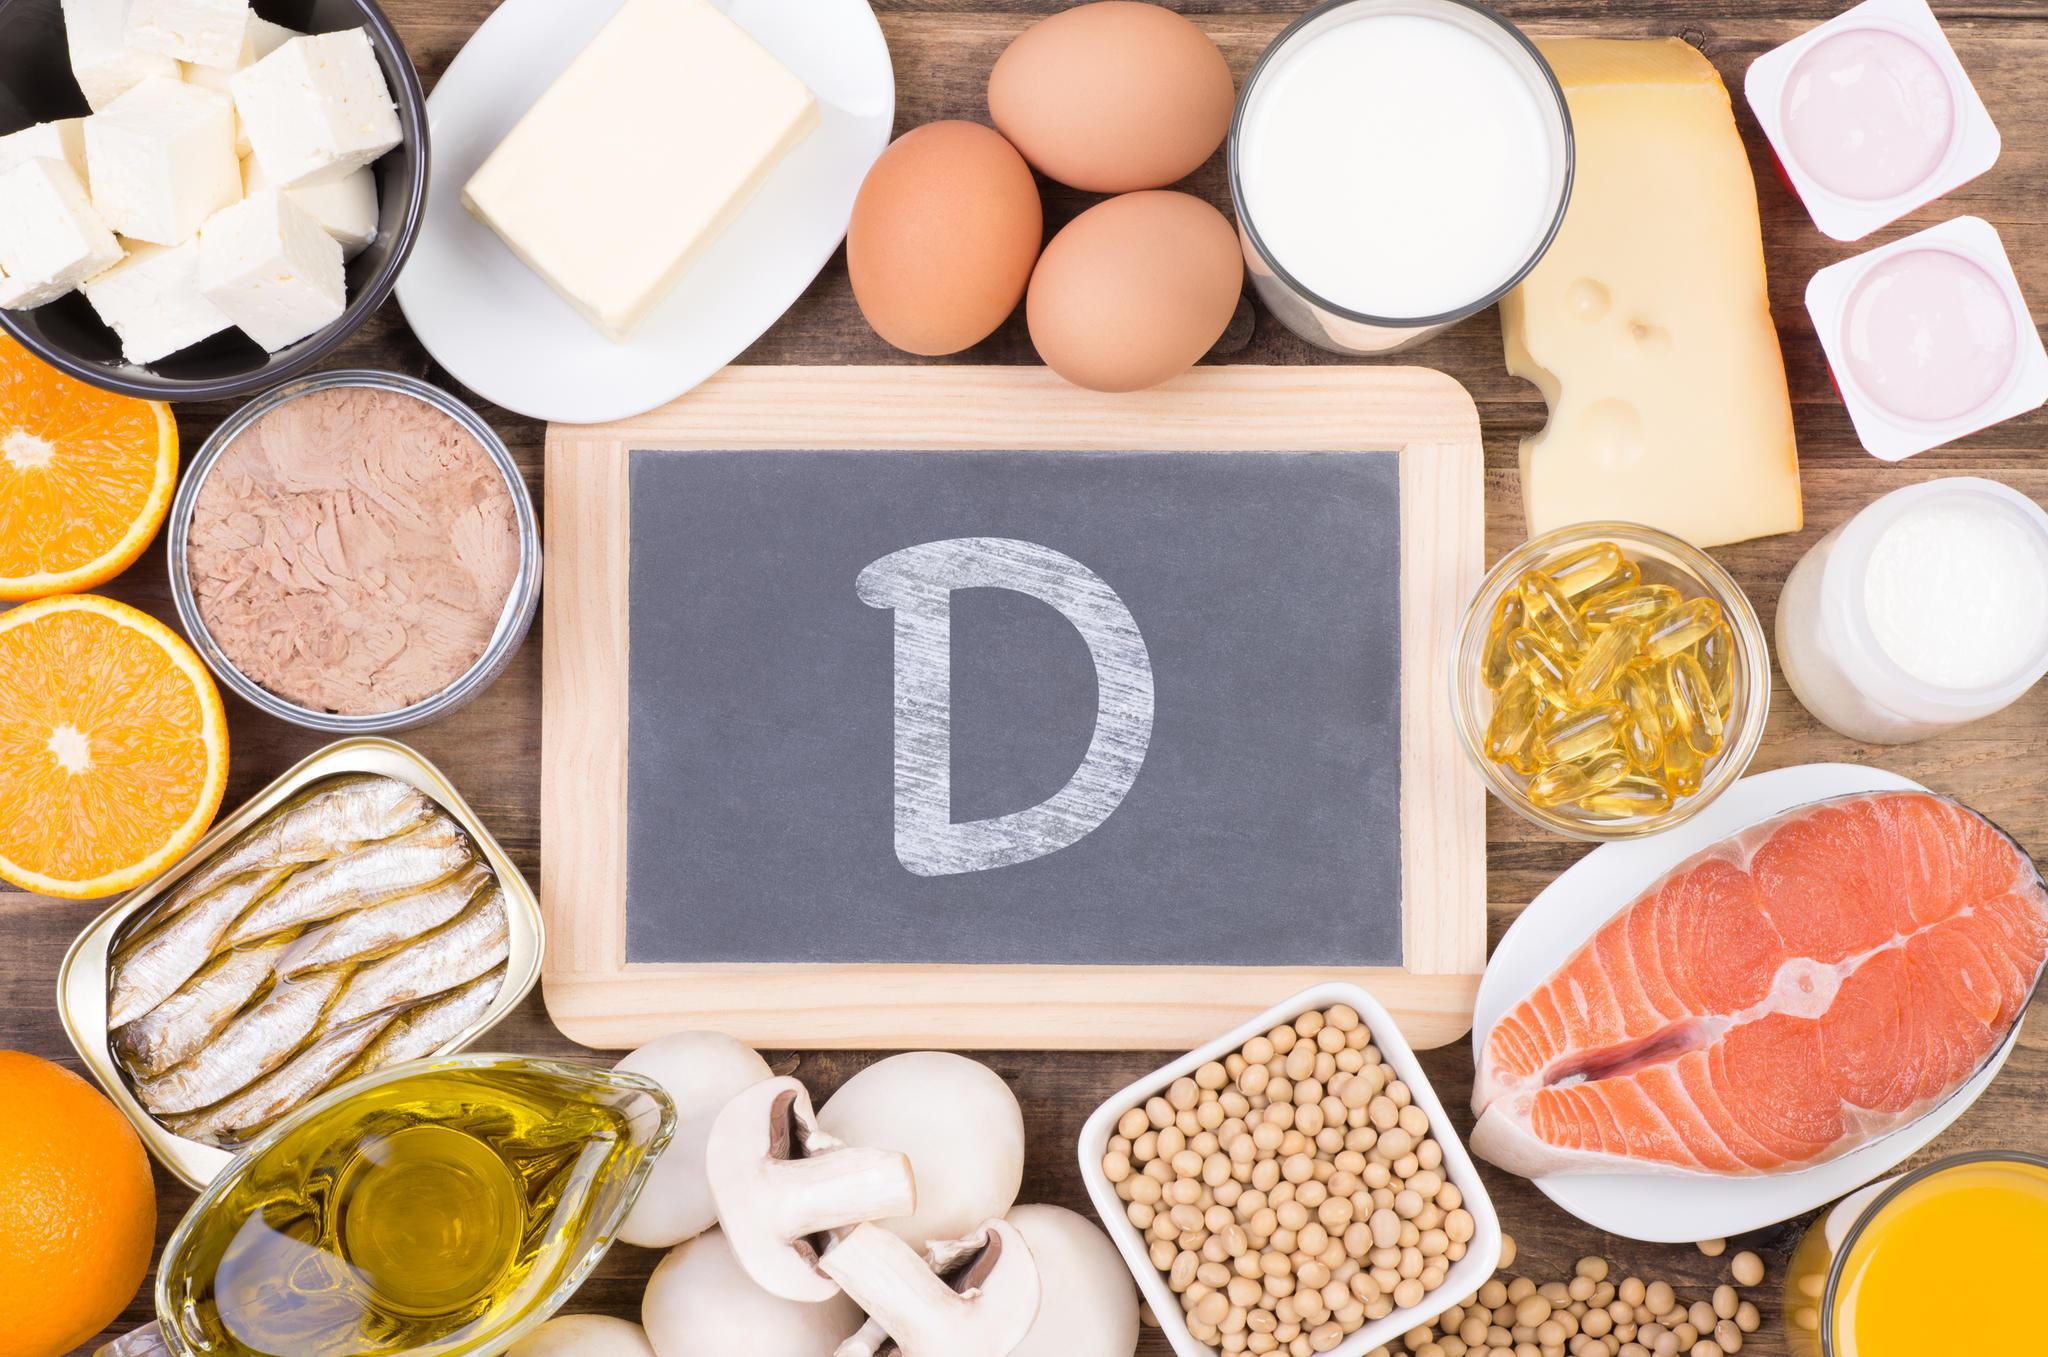 Vitamin D, Vitaminaufnahme, Nahrungsaufnahme, Nahrungsergänzungsmittel